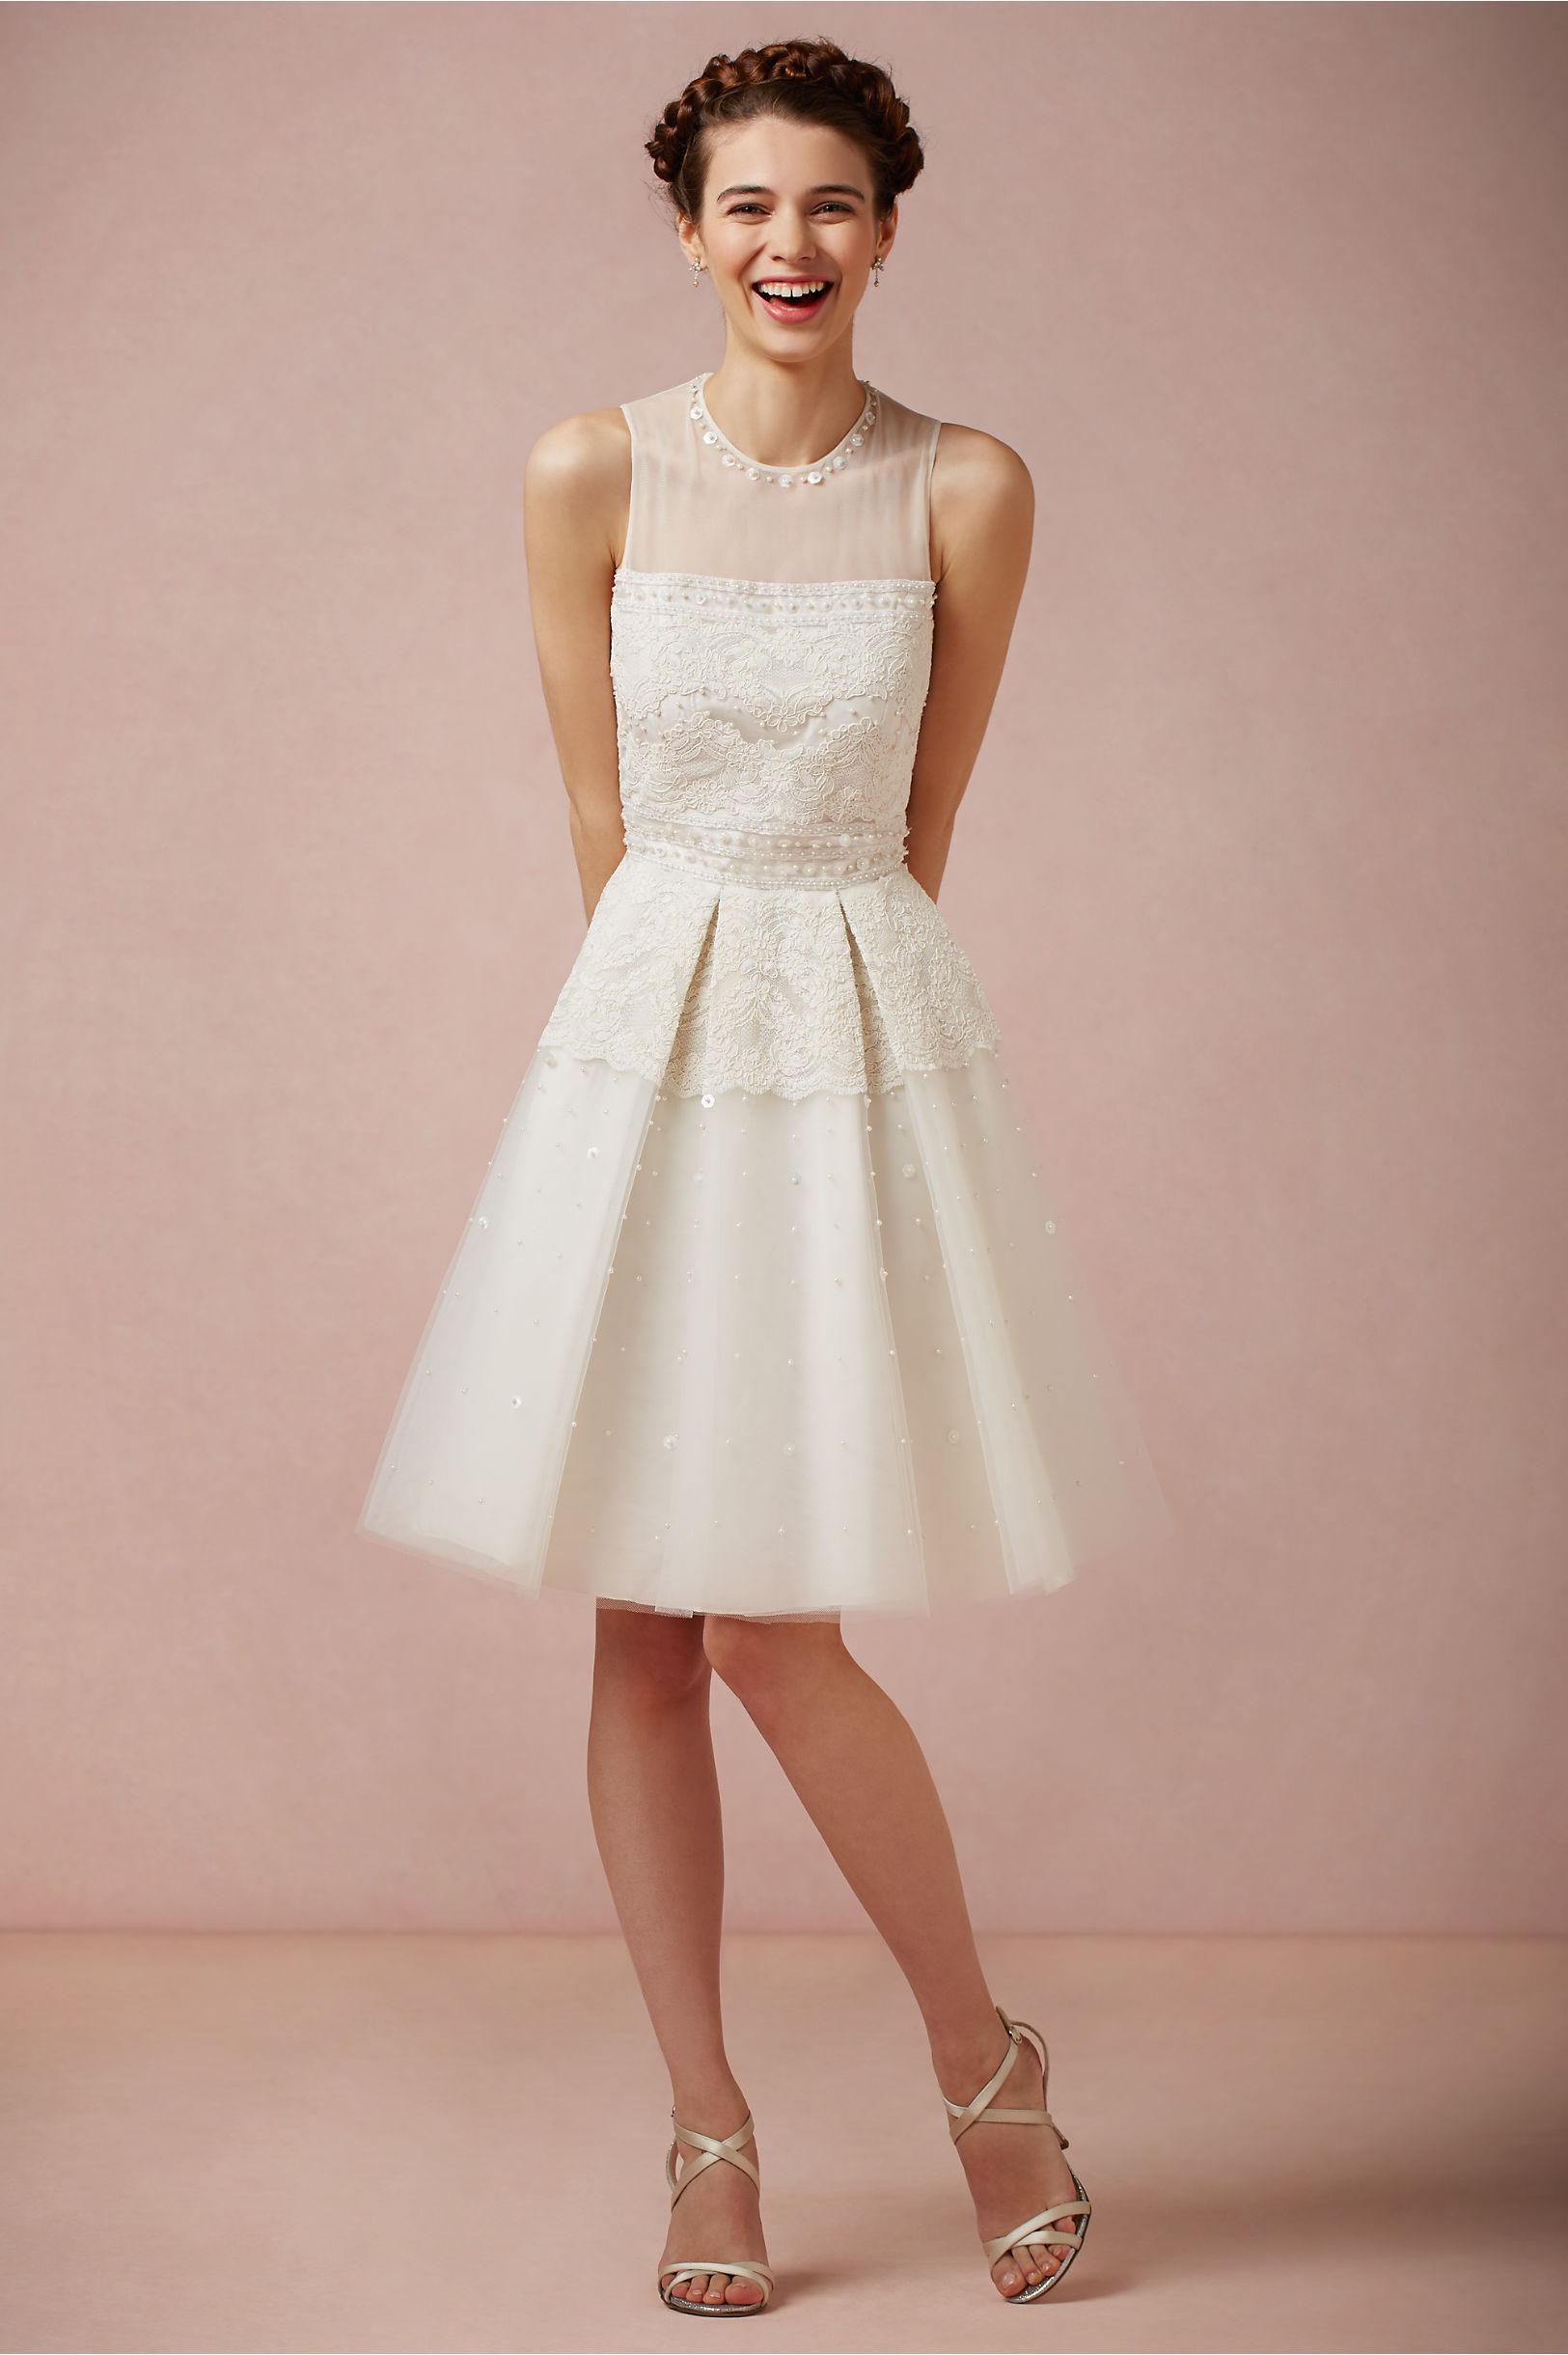 White Short Lace Dress